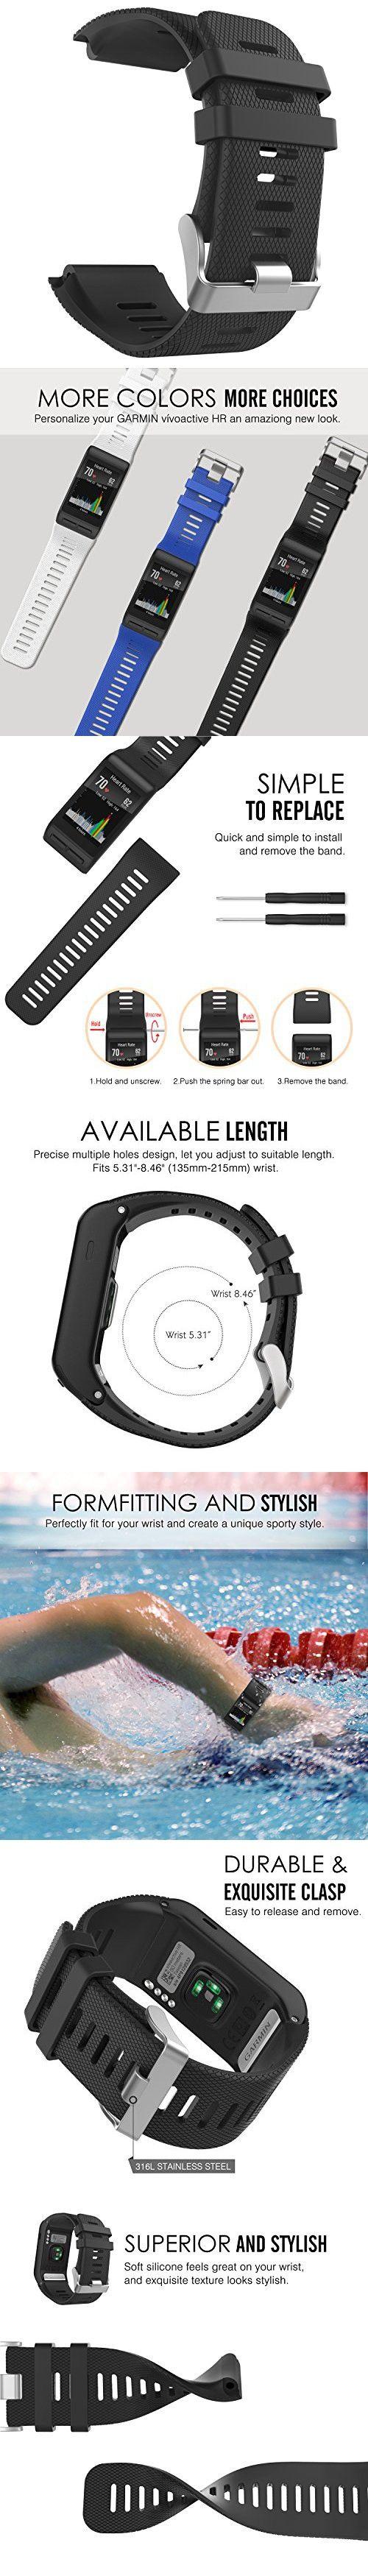 Garmin Vivoactive HR Watch Band, MoKo Soft Silicone Replacement Watch Band ONLY for Garmin Vivoactive HR Sports GPS Smart Watch with Adapter Tools - BLACK